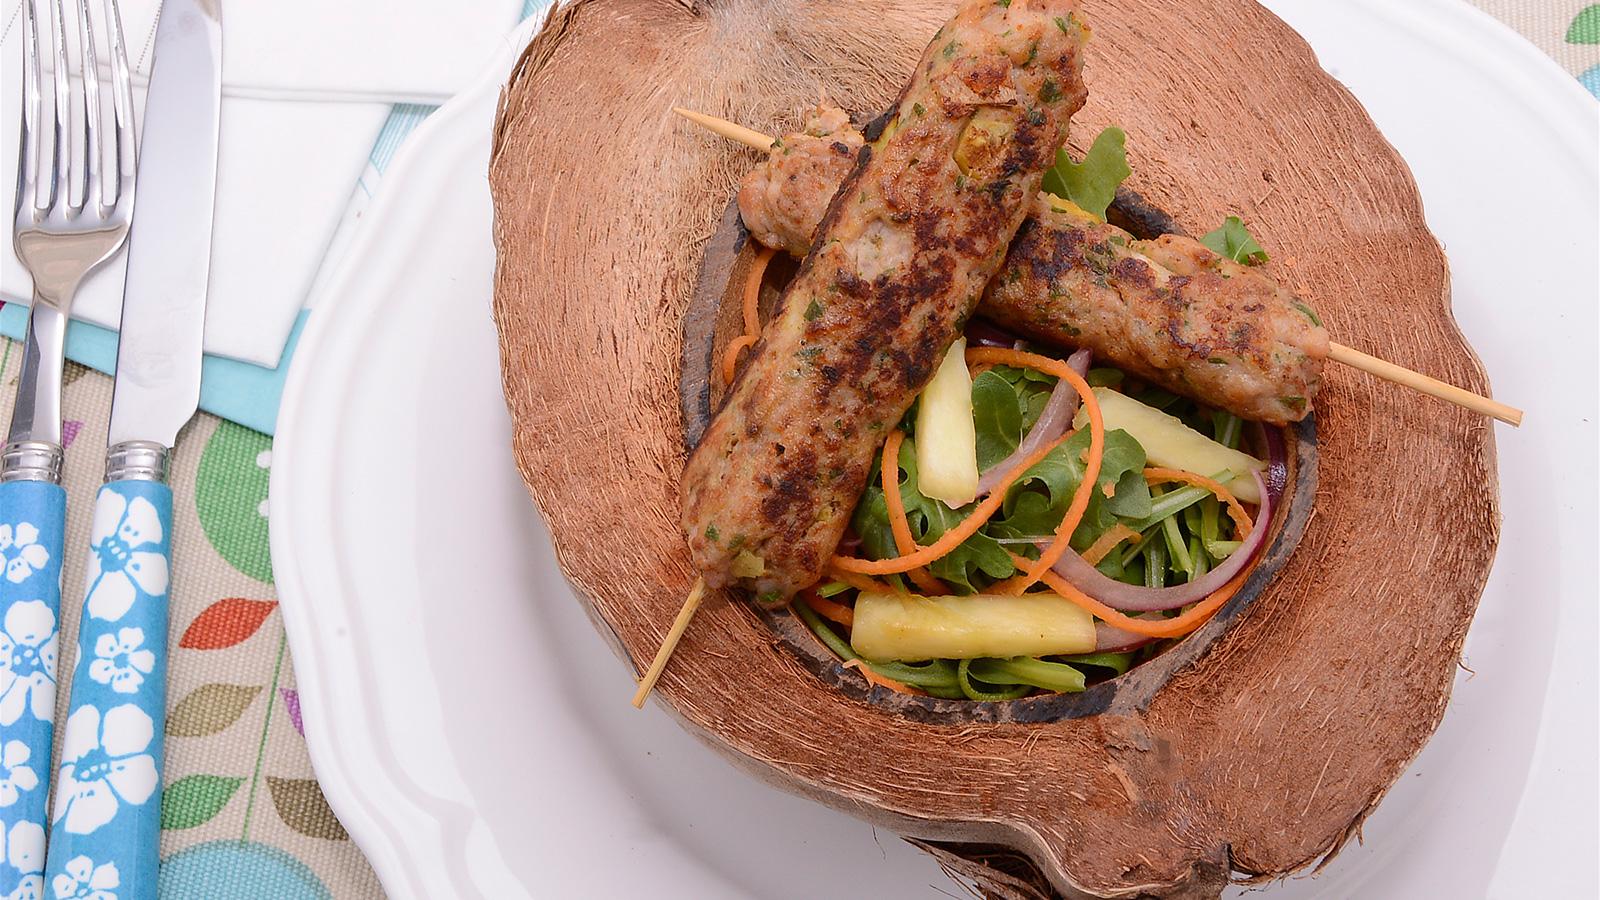 Brocheta de pollo con pi a y coco diana cabrera receta canal cocina - Diana cabrera canal cocina ...